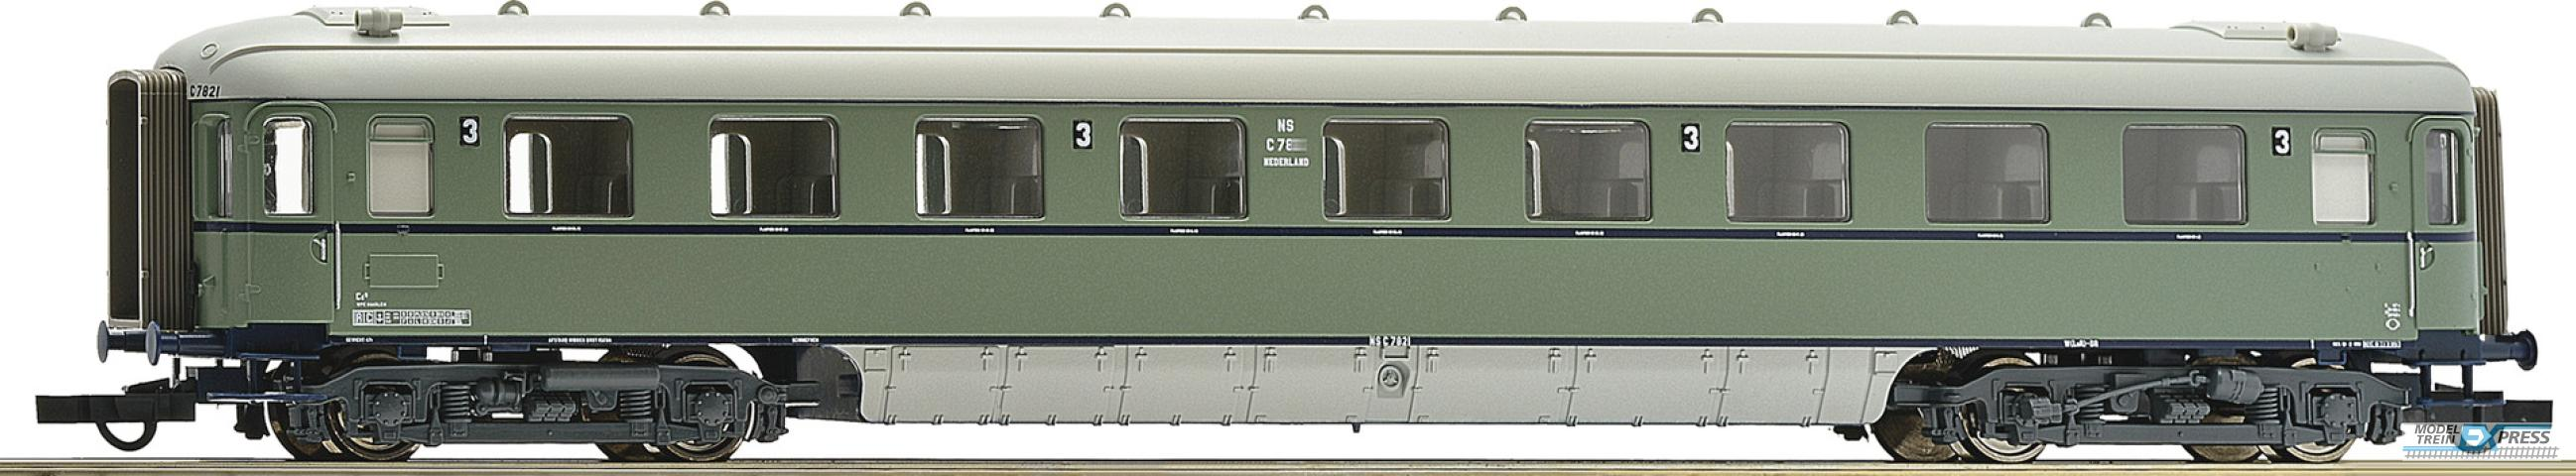 Roco 64997